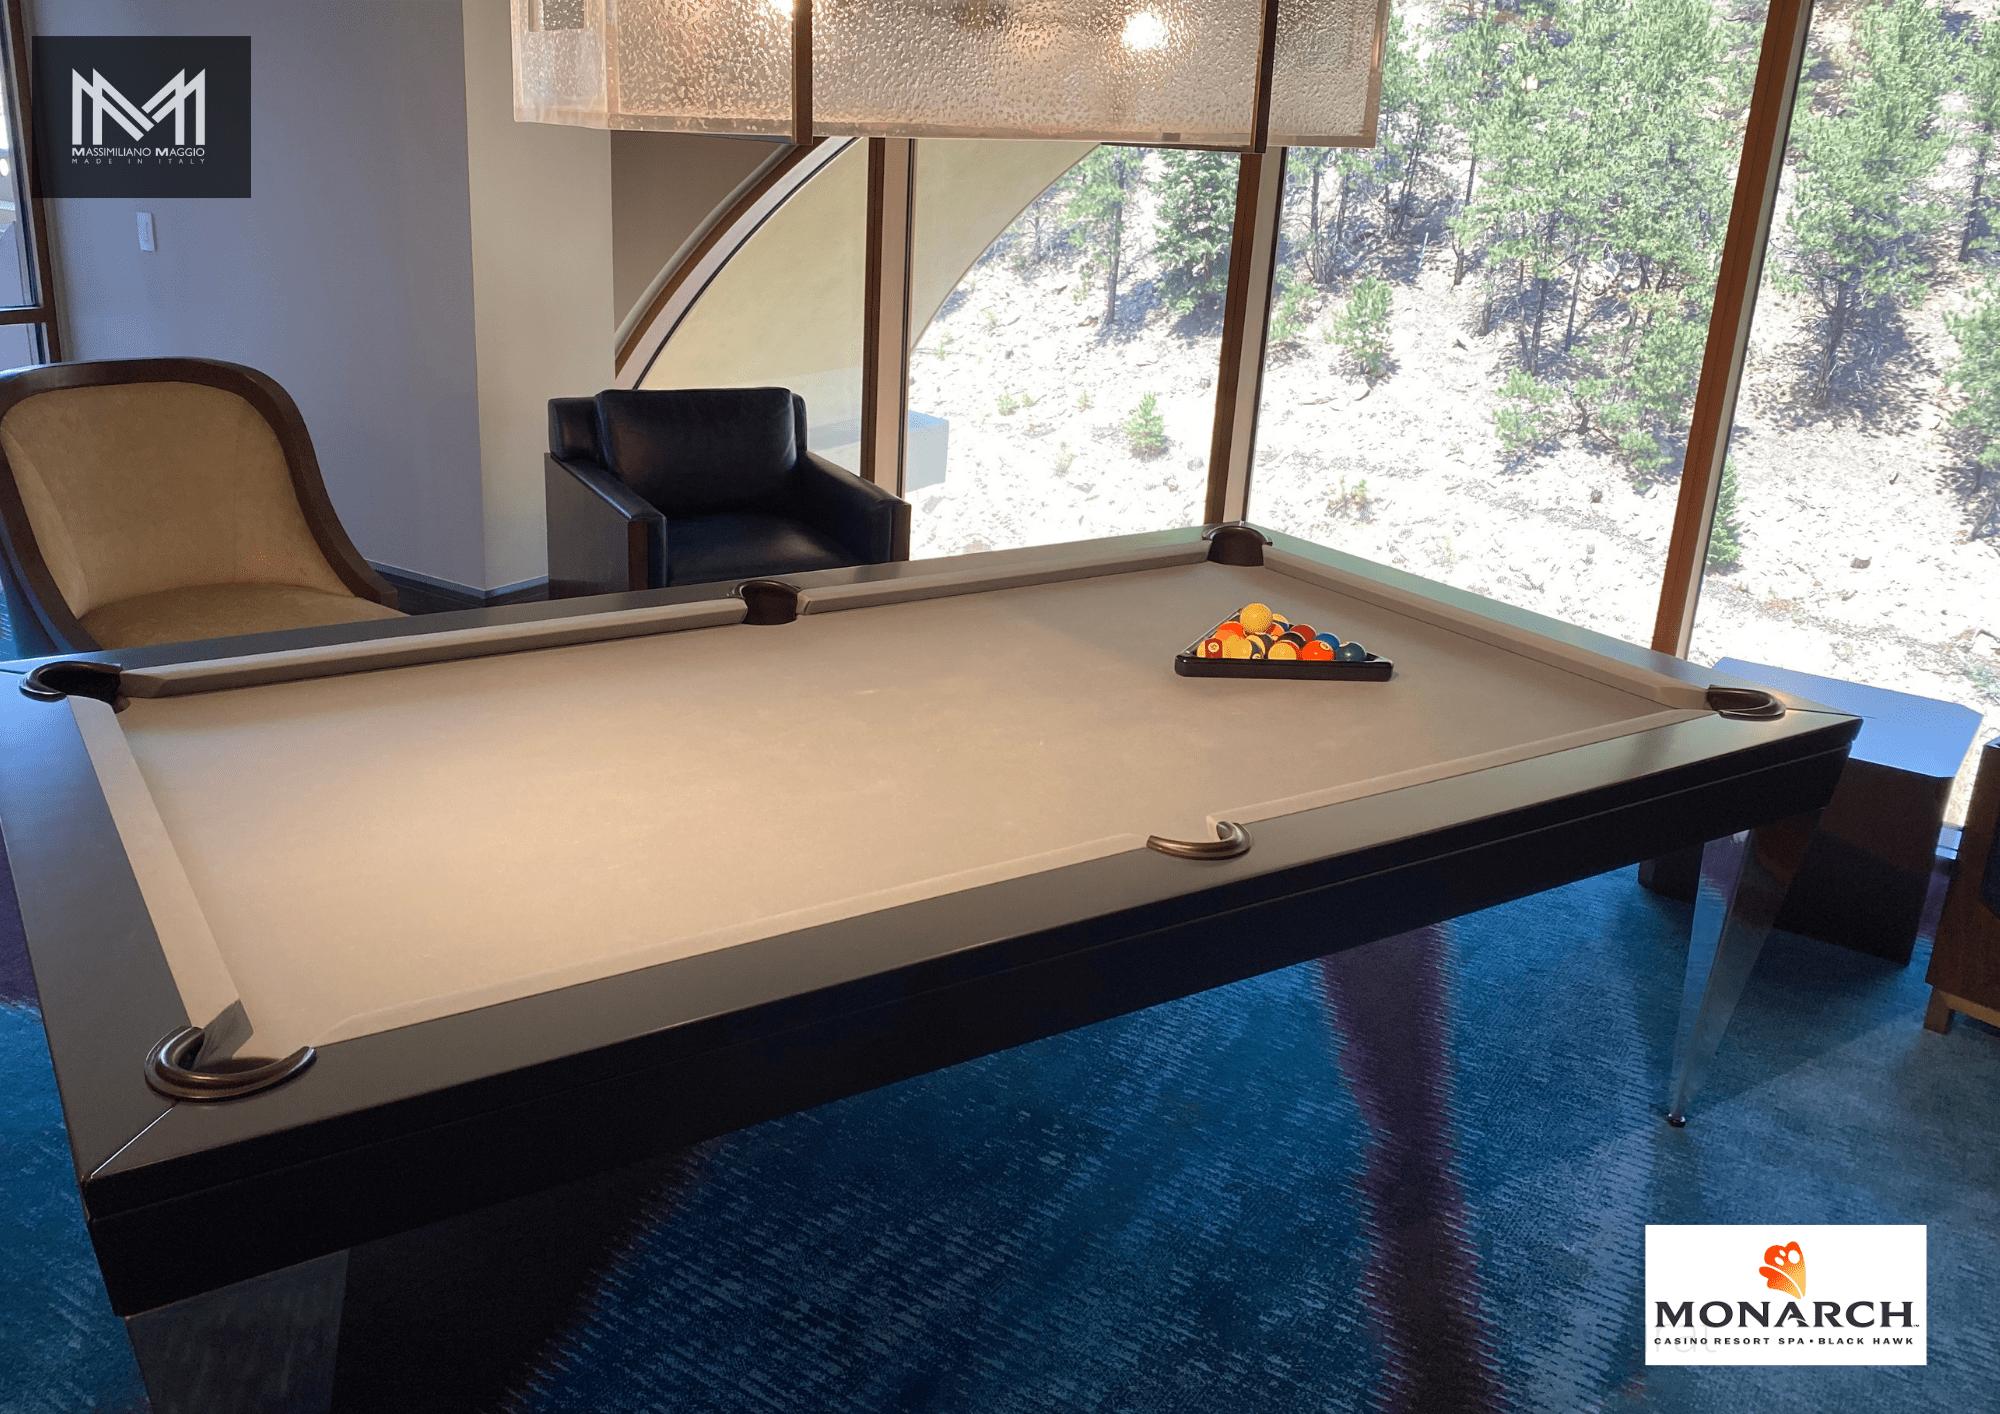 M6 Monarch Black Hawk Las Vegas Massimiliano Maggio Made in Italy Luxury Pool Table biliardo tavolo.png